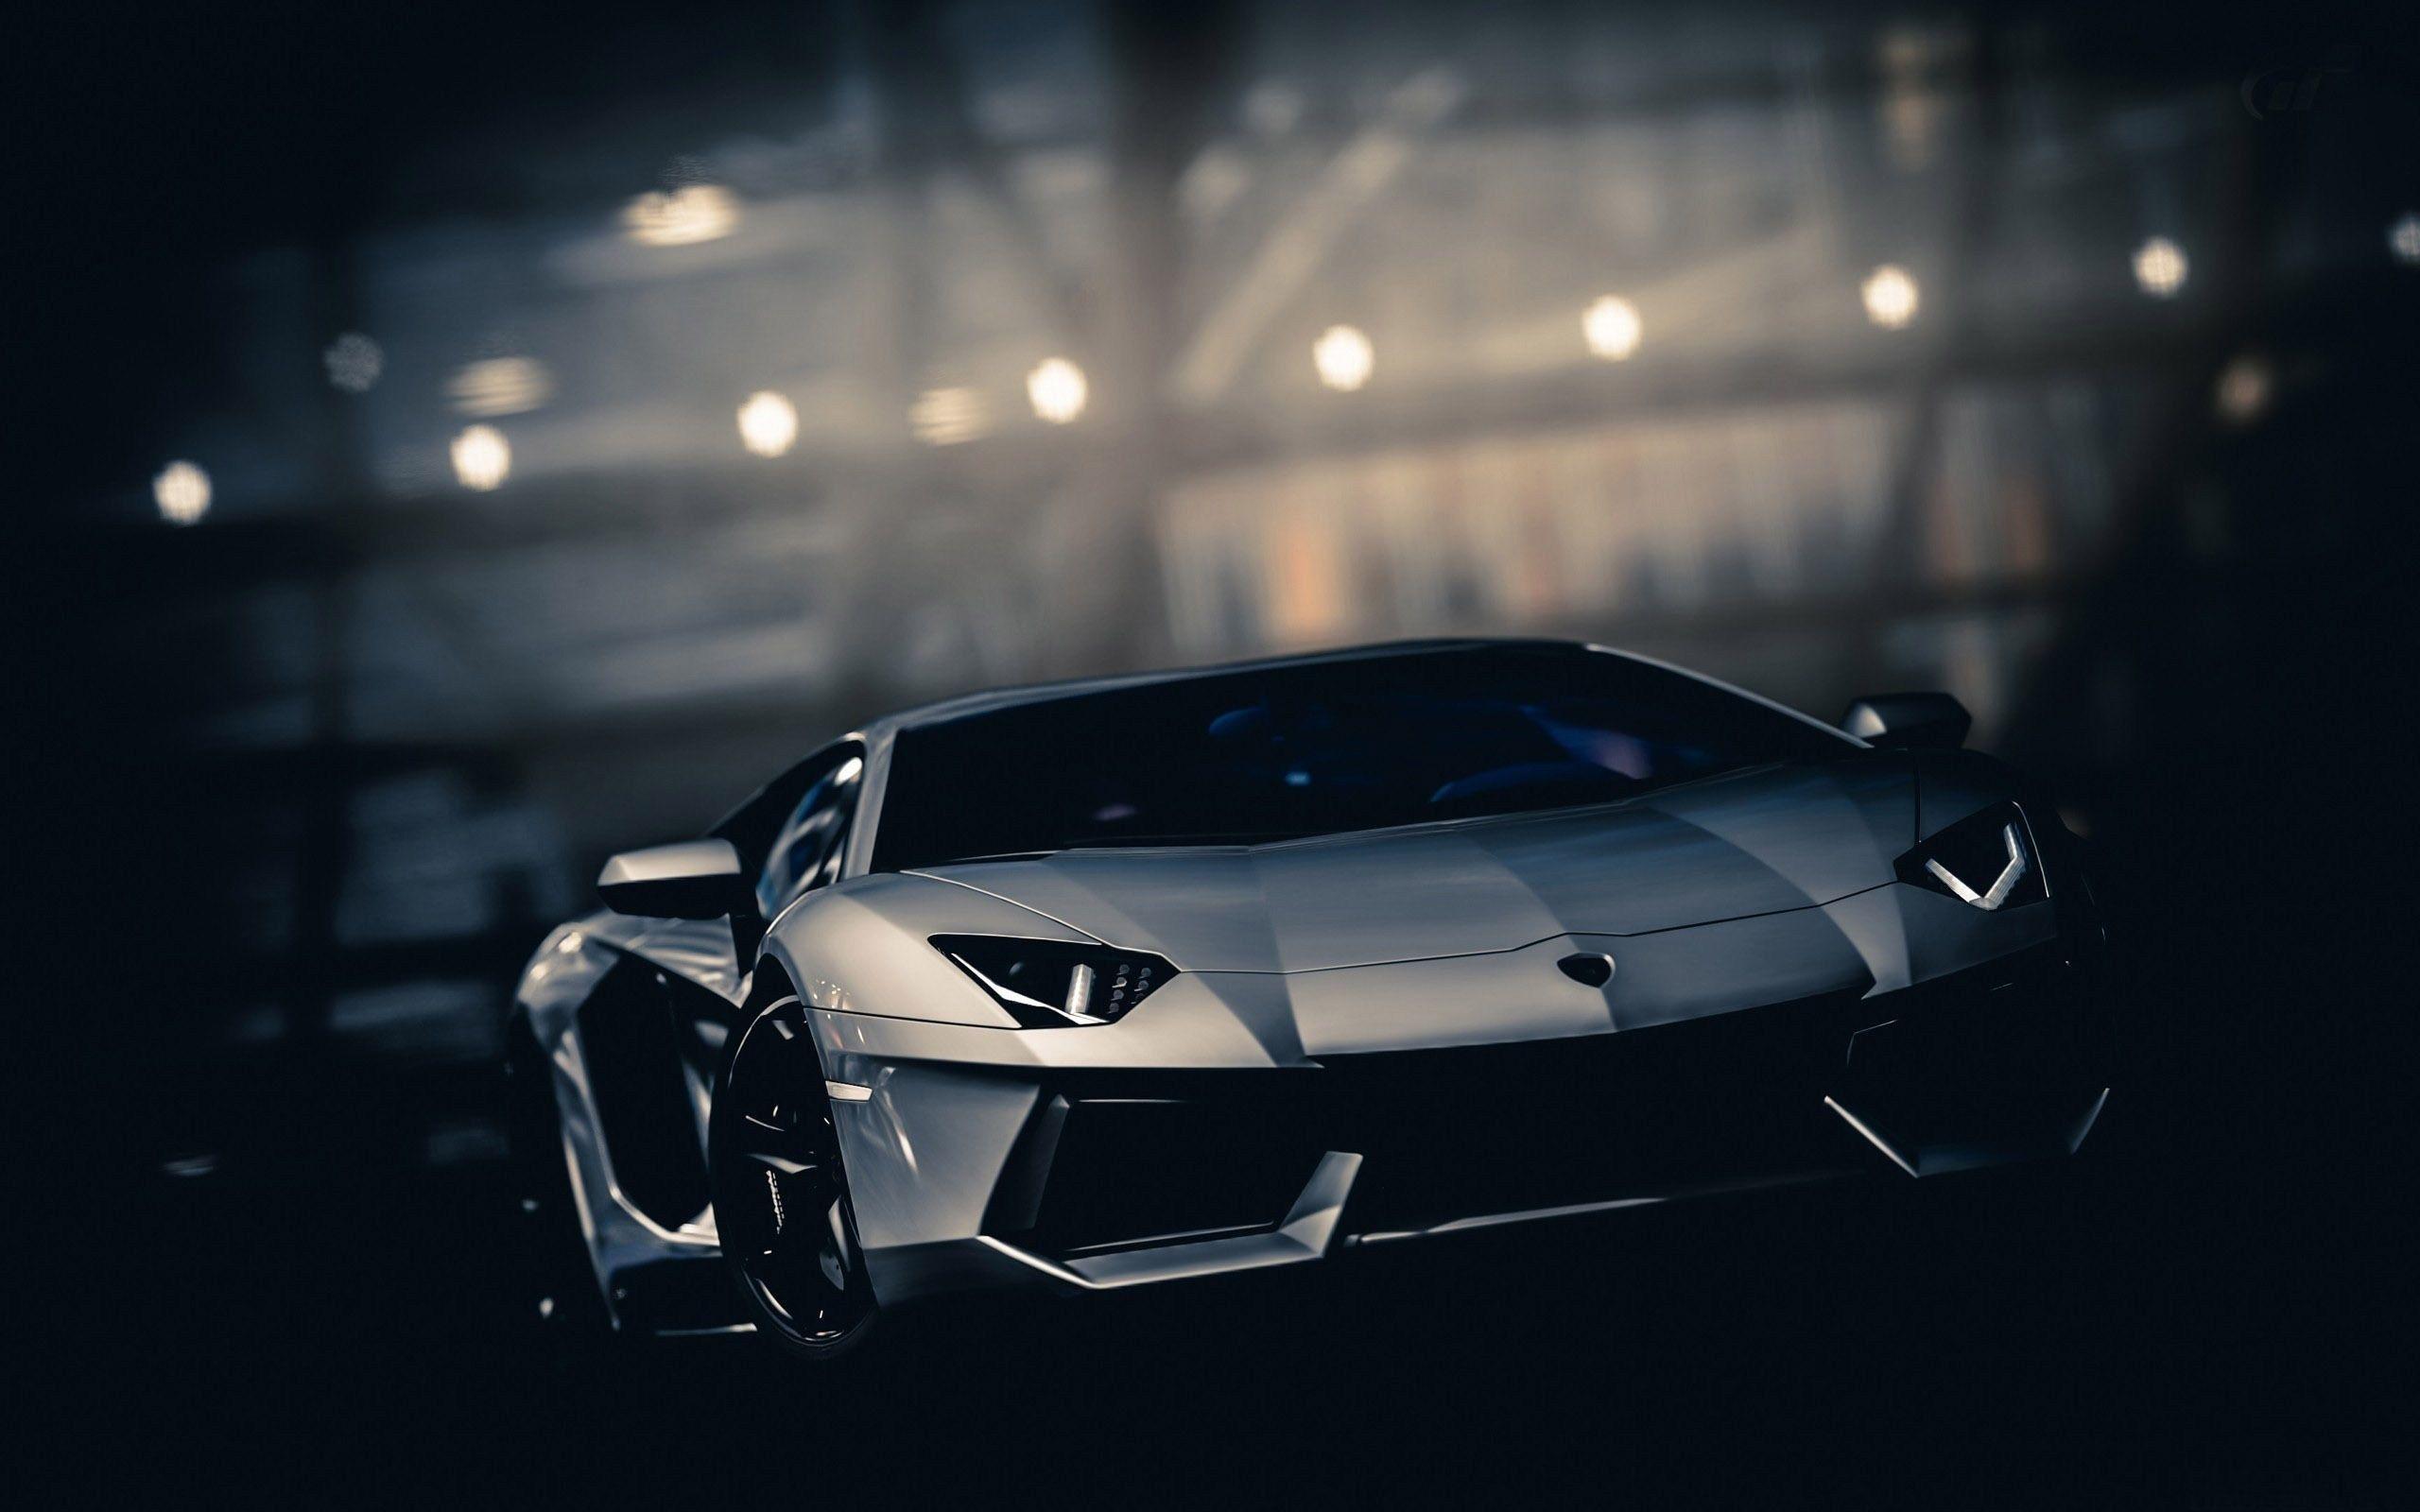 Best New Car Lamborghini Wallpaper Png 1080p Iphone In 2021 Sports Car Wallpaper Lamborghini Aventador Wallpaper Lamborghini Aventador